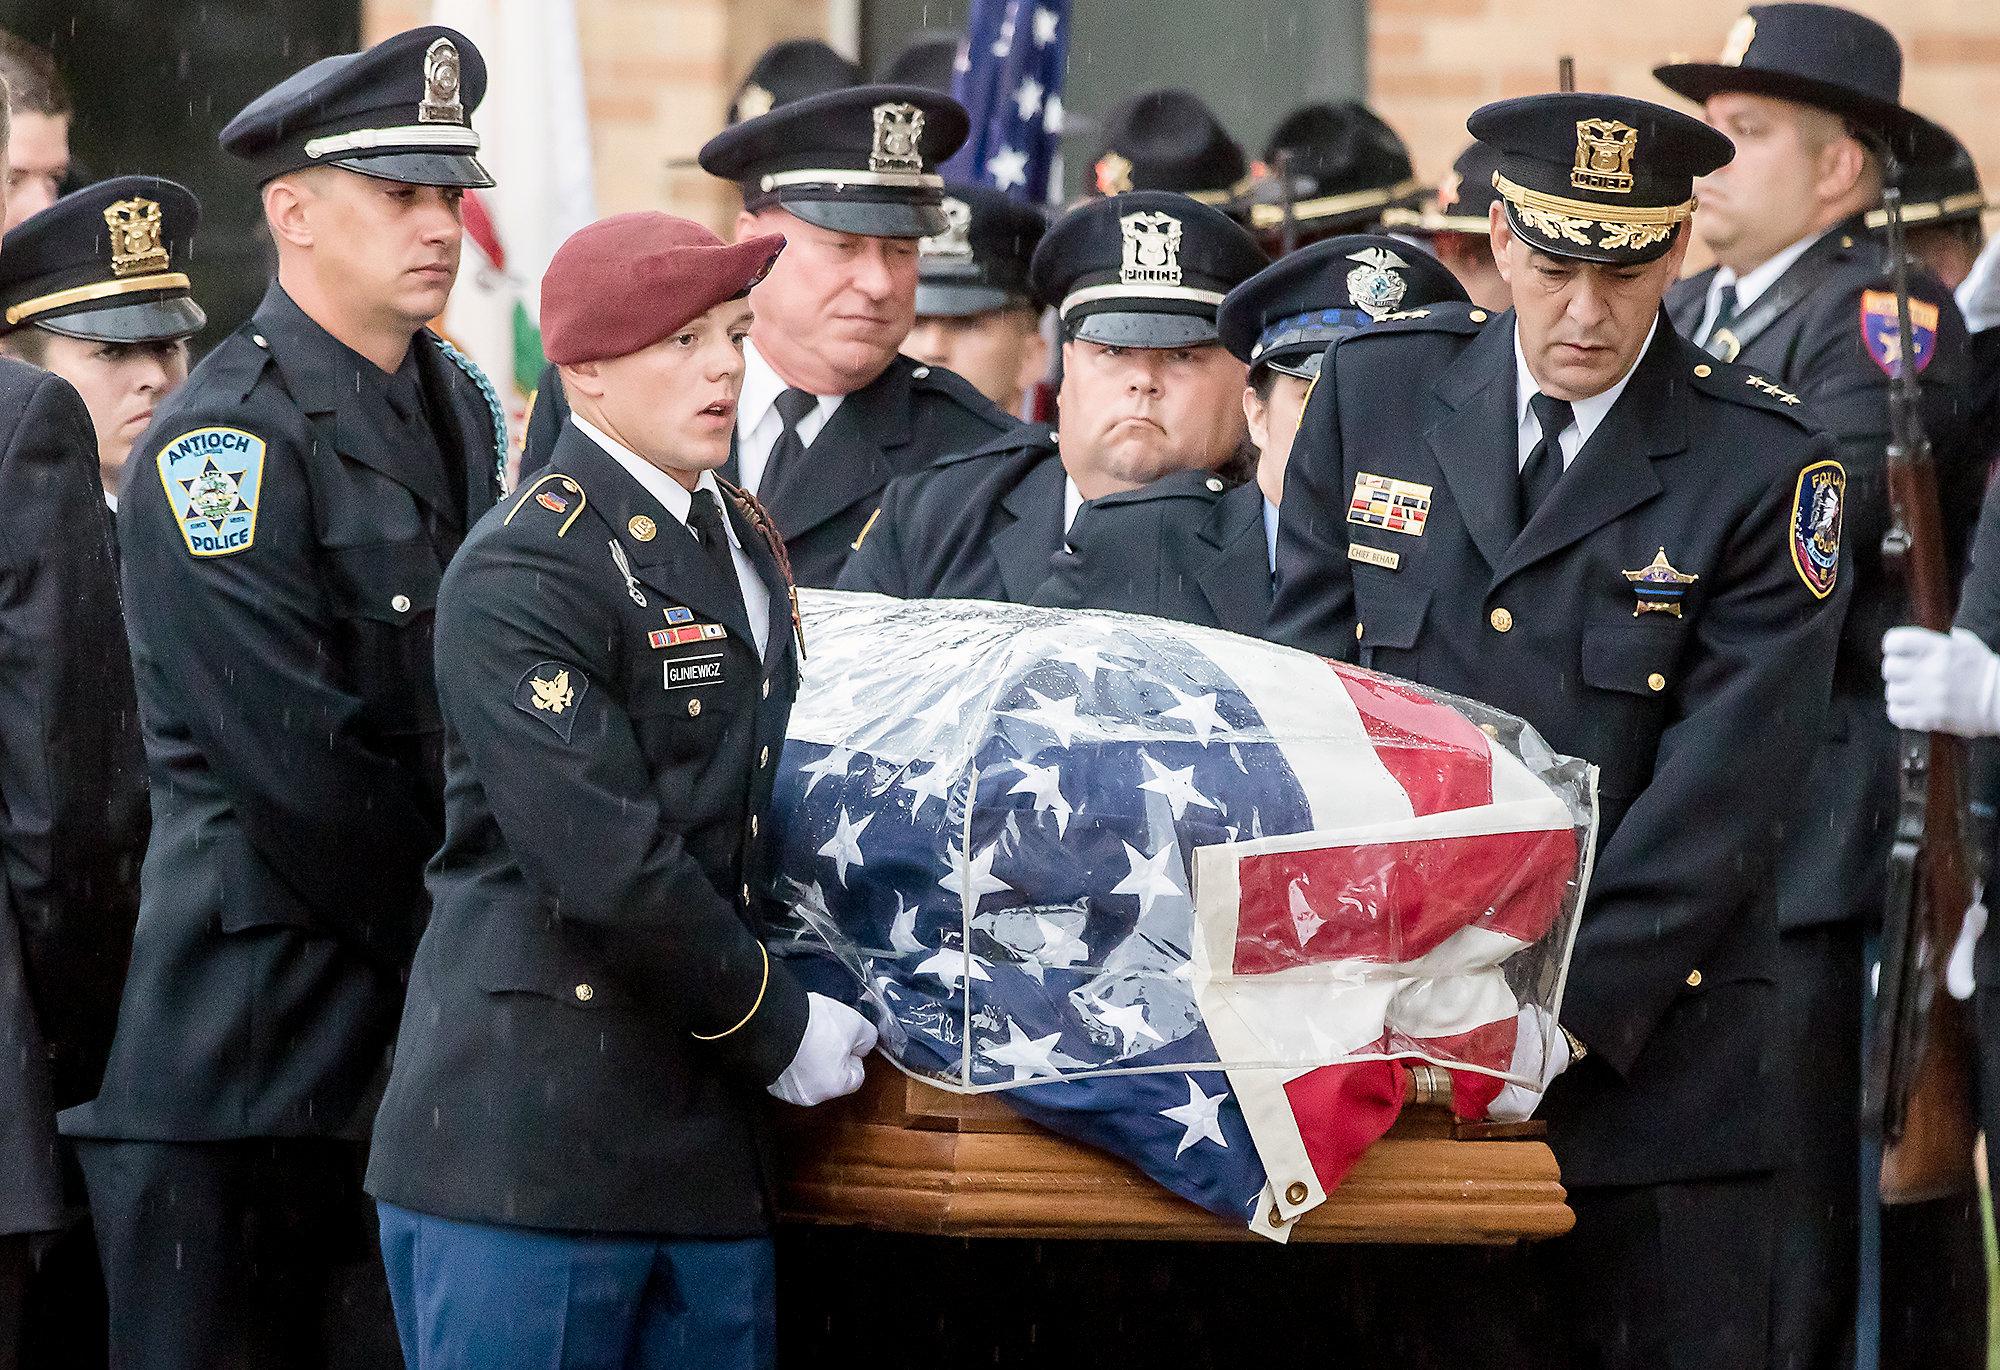 HNEWS_mon0907_Cop_Funeral41.jpg